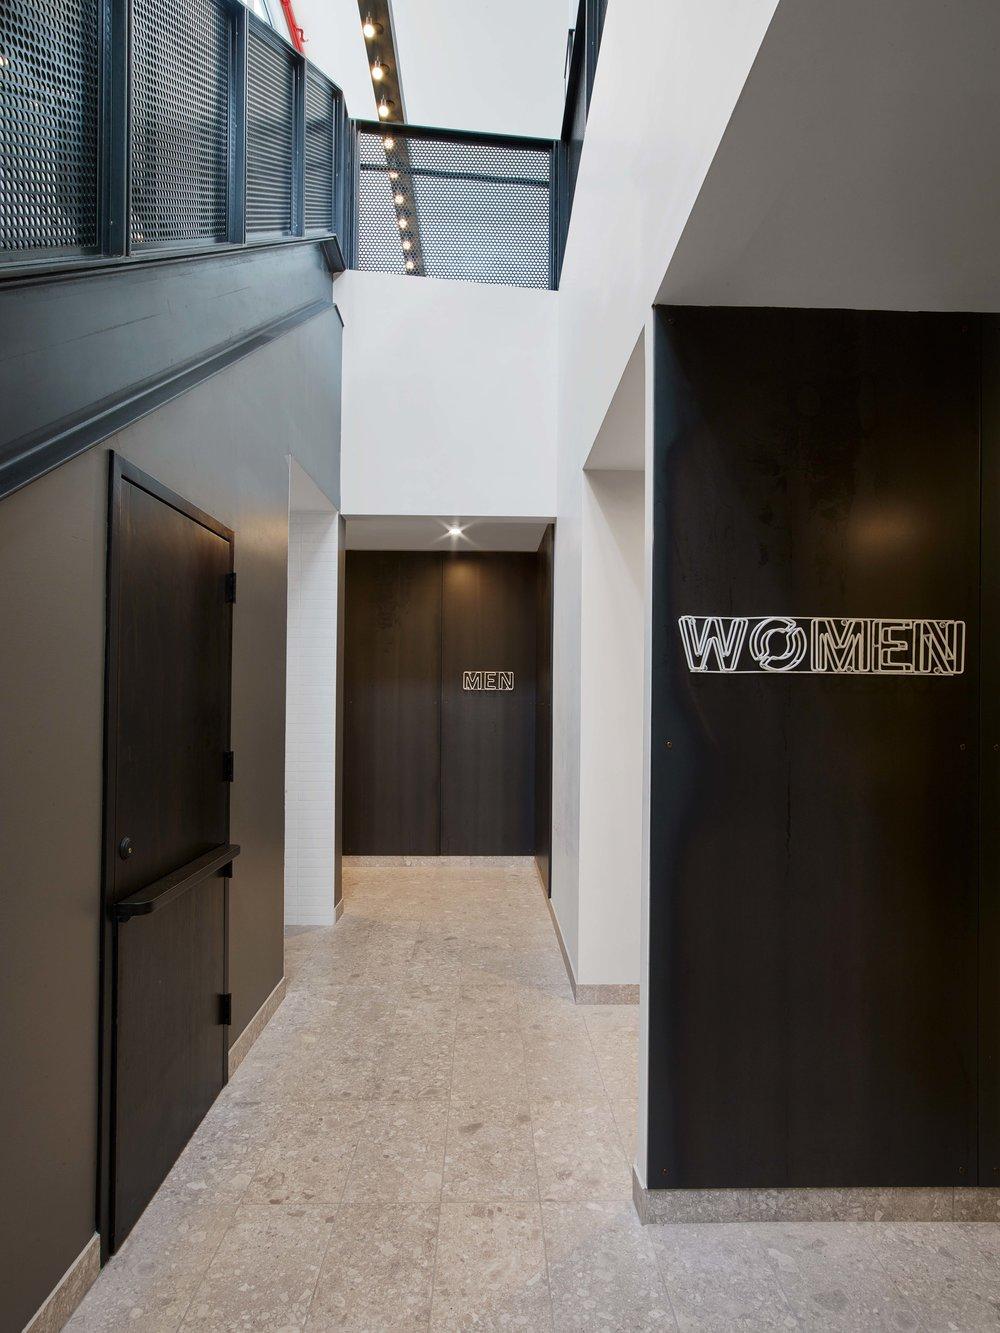 Equinox Williamsburg Locker Room Entrances and Stair